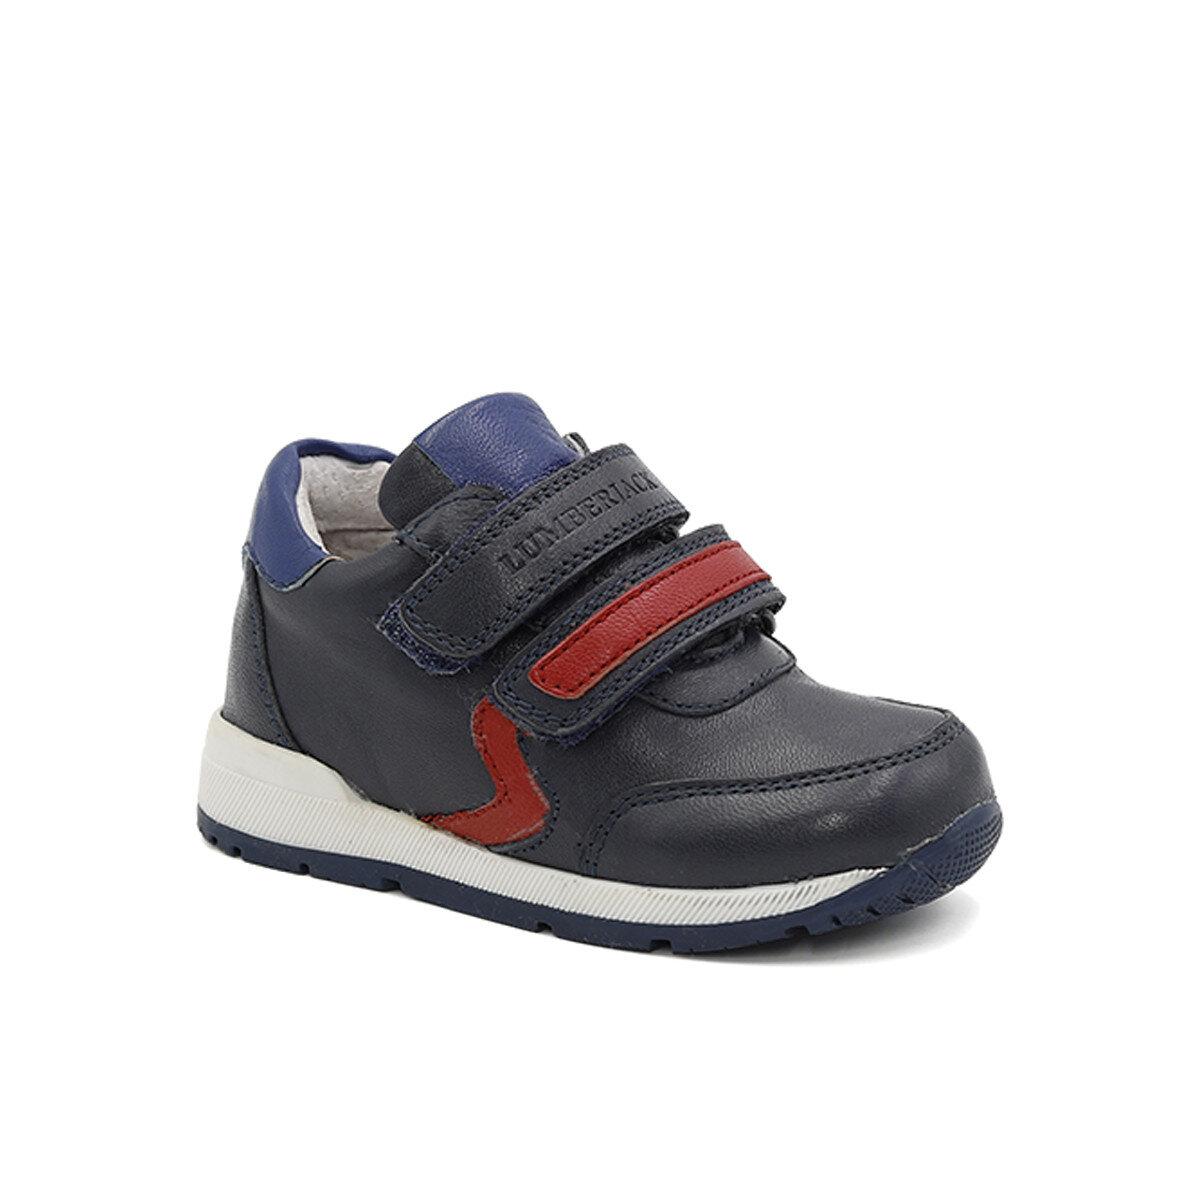 SQUISH Sneakers Bambino